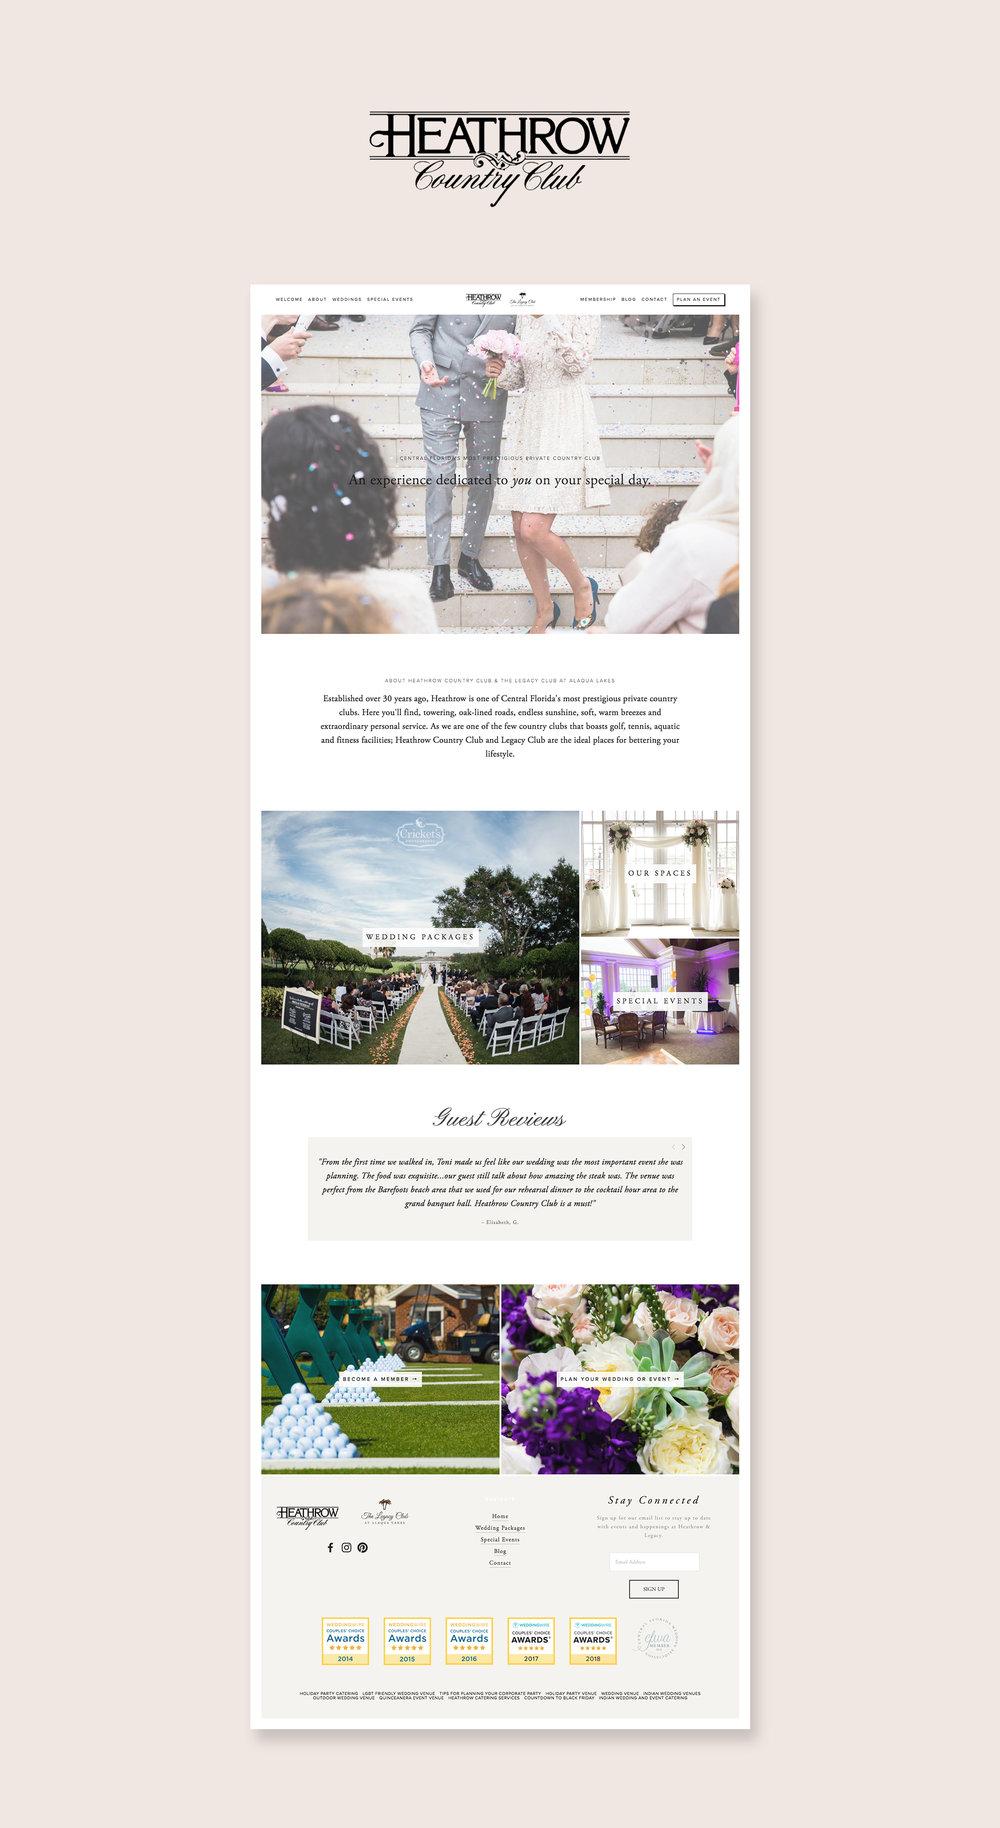 Squarespace Website Design Services - Heathrow Country Club